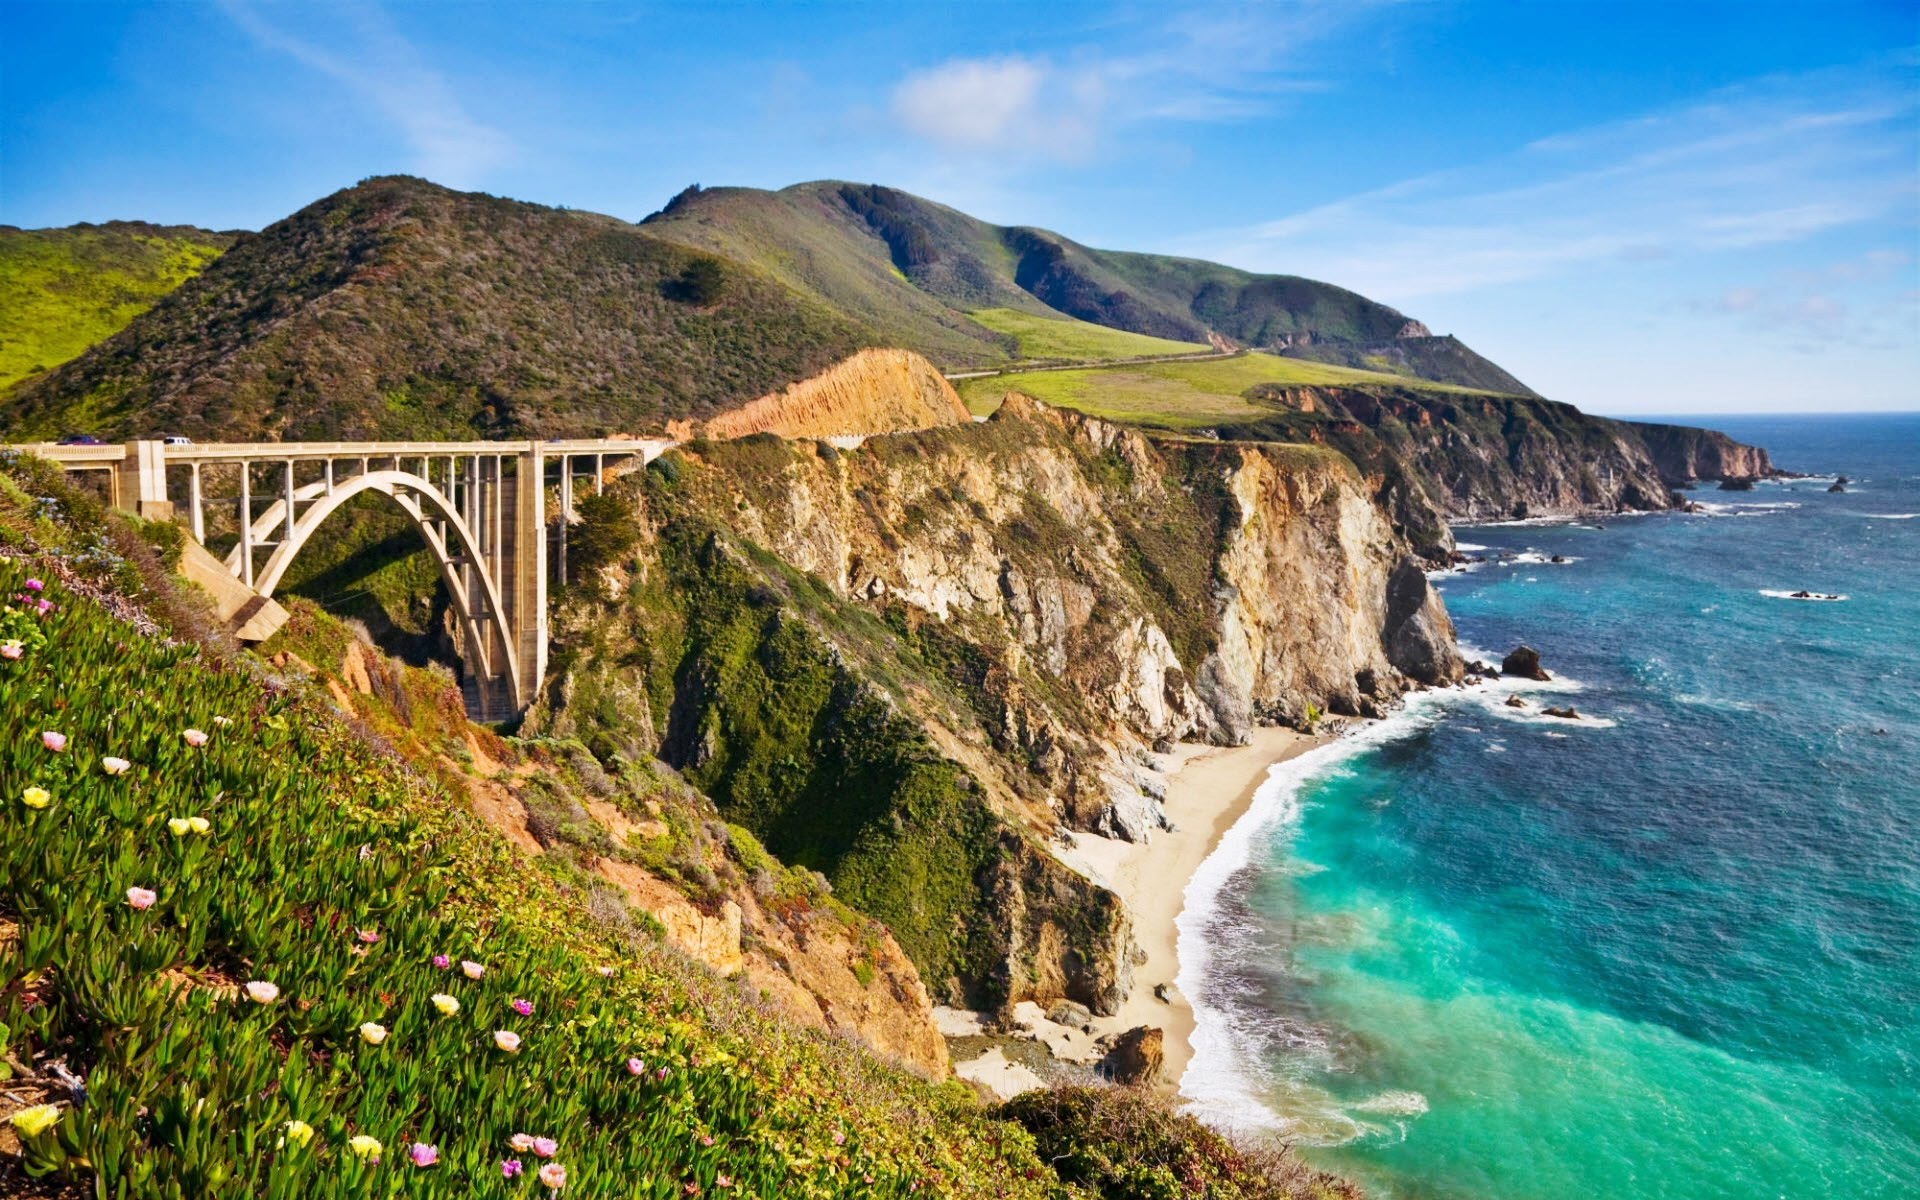 Pacific coast photo